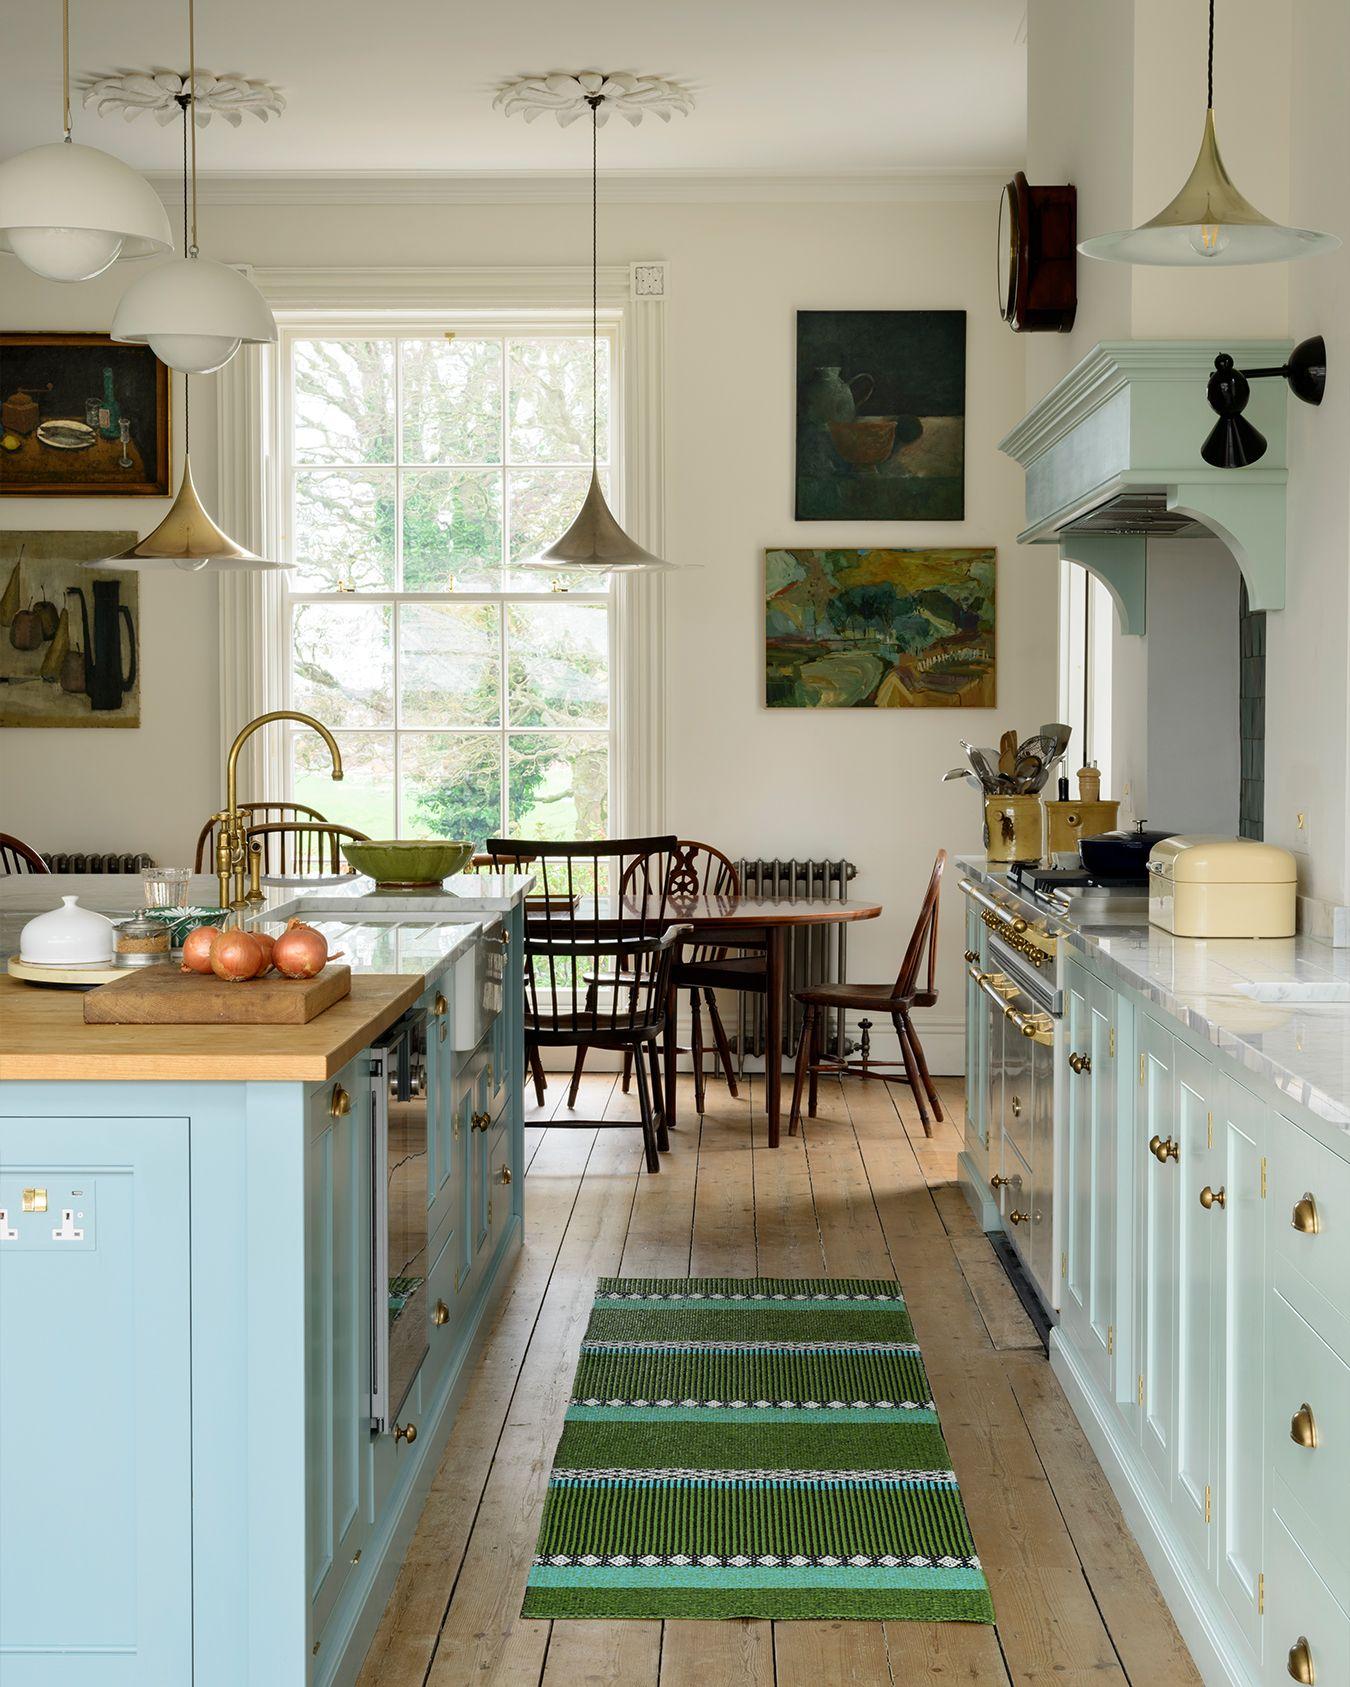 46 Fabulous Country Kitchen Designs Ideas: Classic Georgian Style English